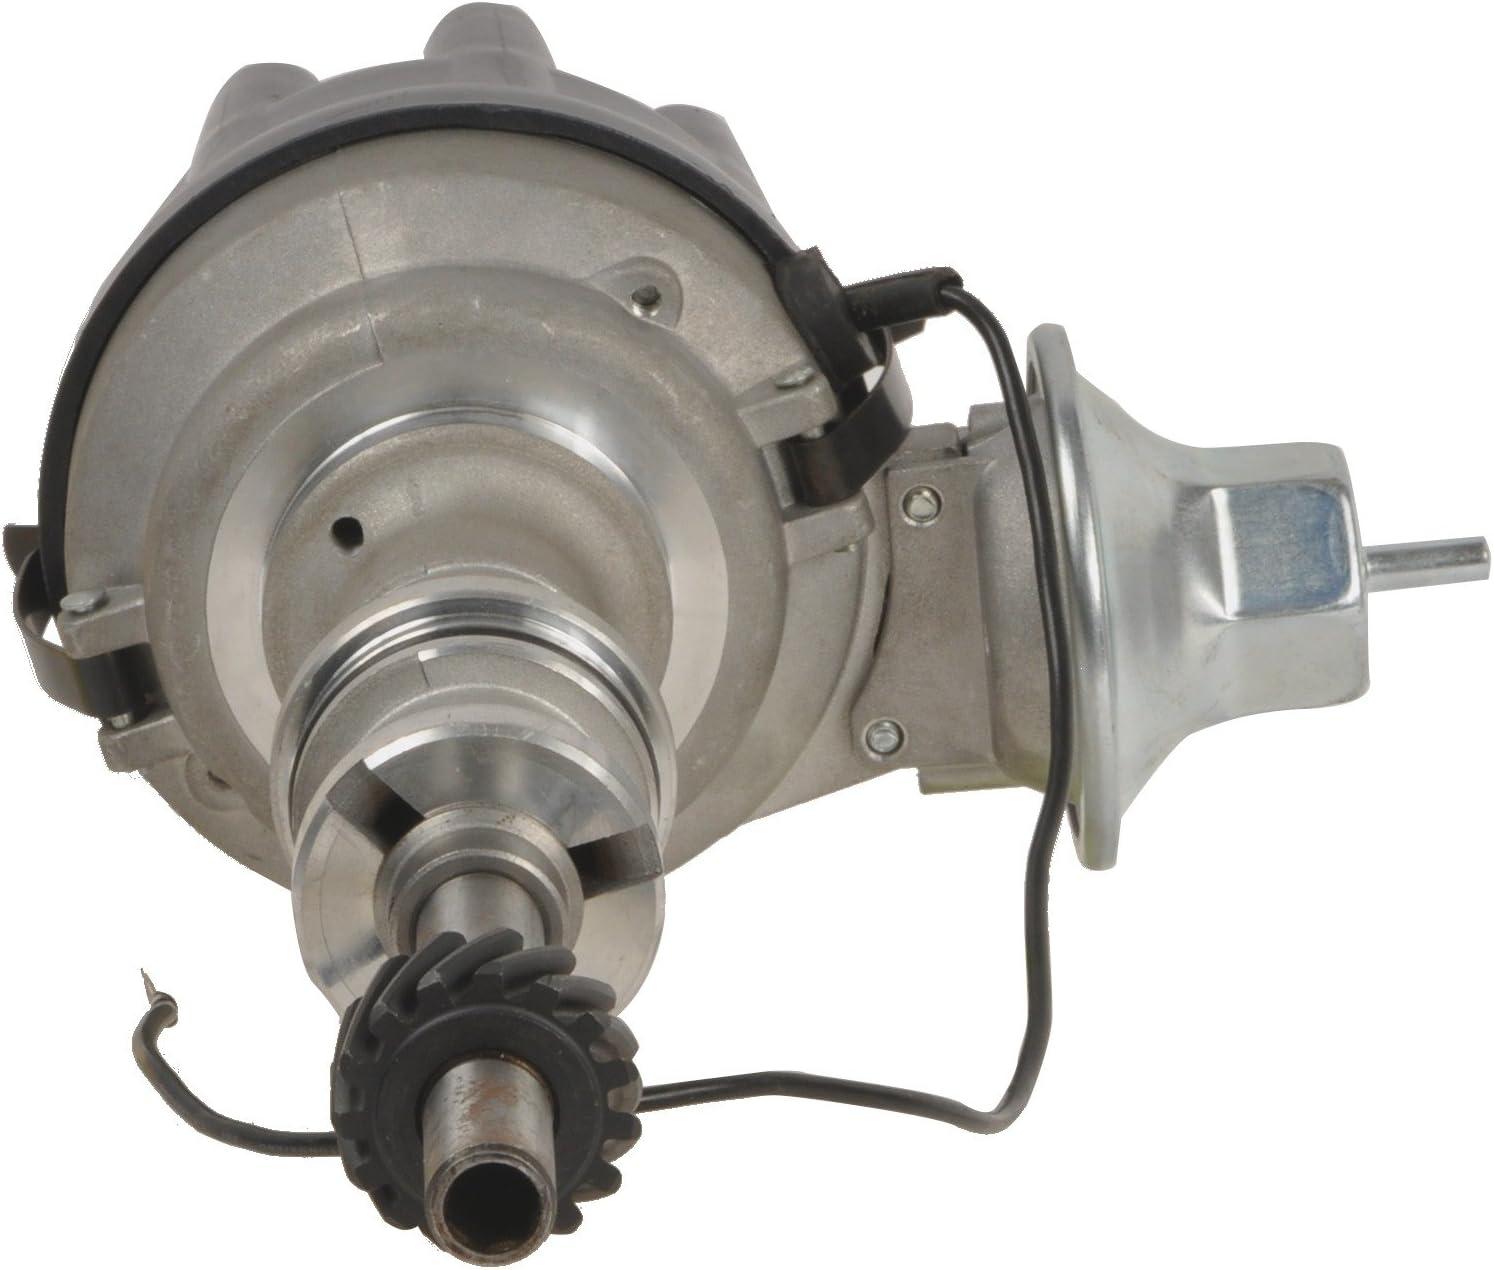 SUZUKI GSXR1000 HORN 38500-47H00 GSX R 1000 GSX-R 1000 L1-15 11-15 kr